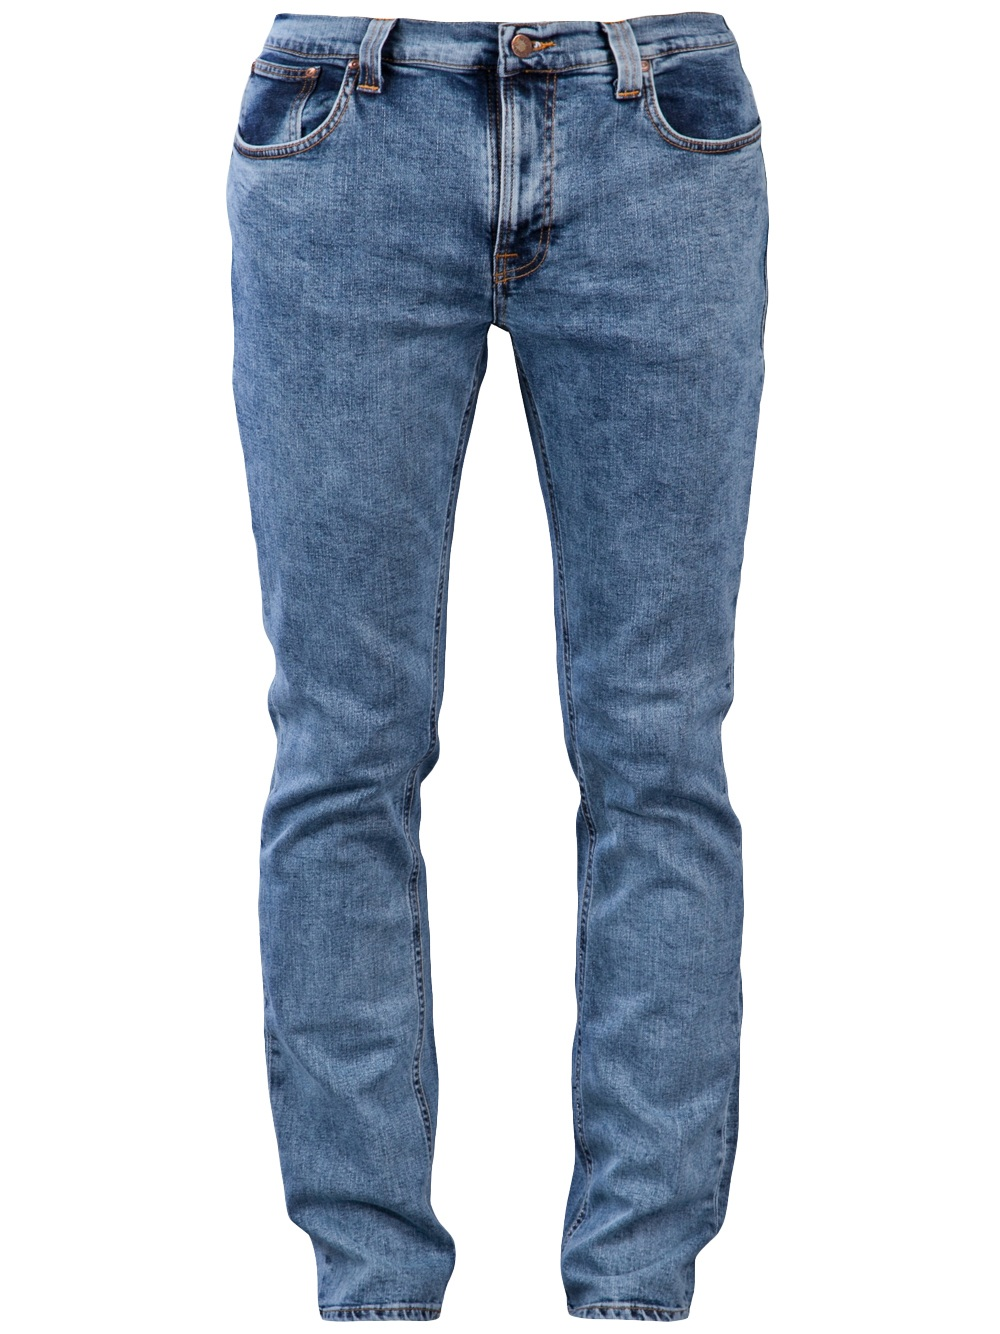 nudie jeans thin finn jean in blue for men lyst. Black Bedroom Furniture Sets. Home Design Ideas